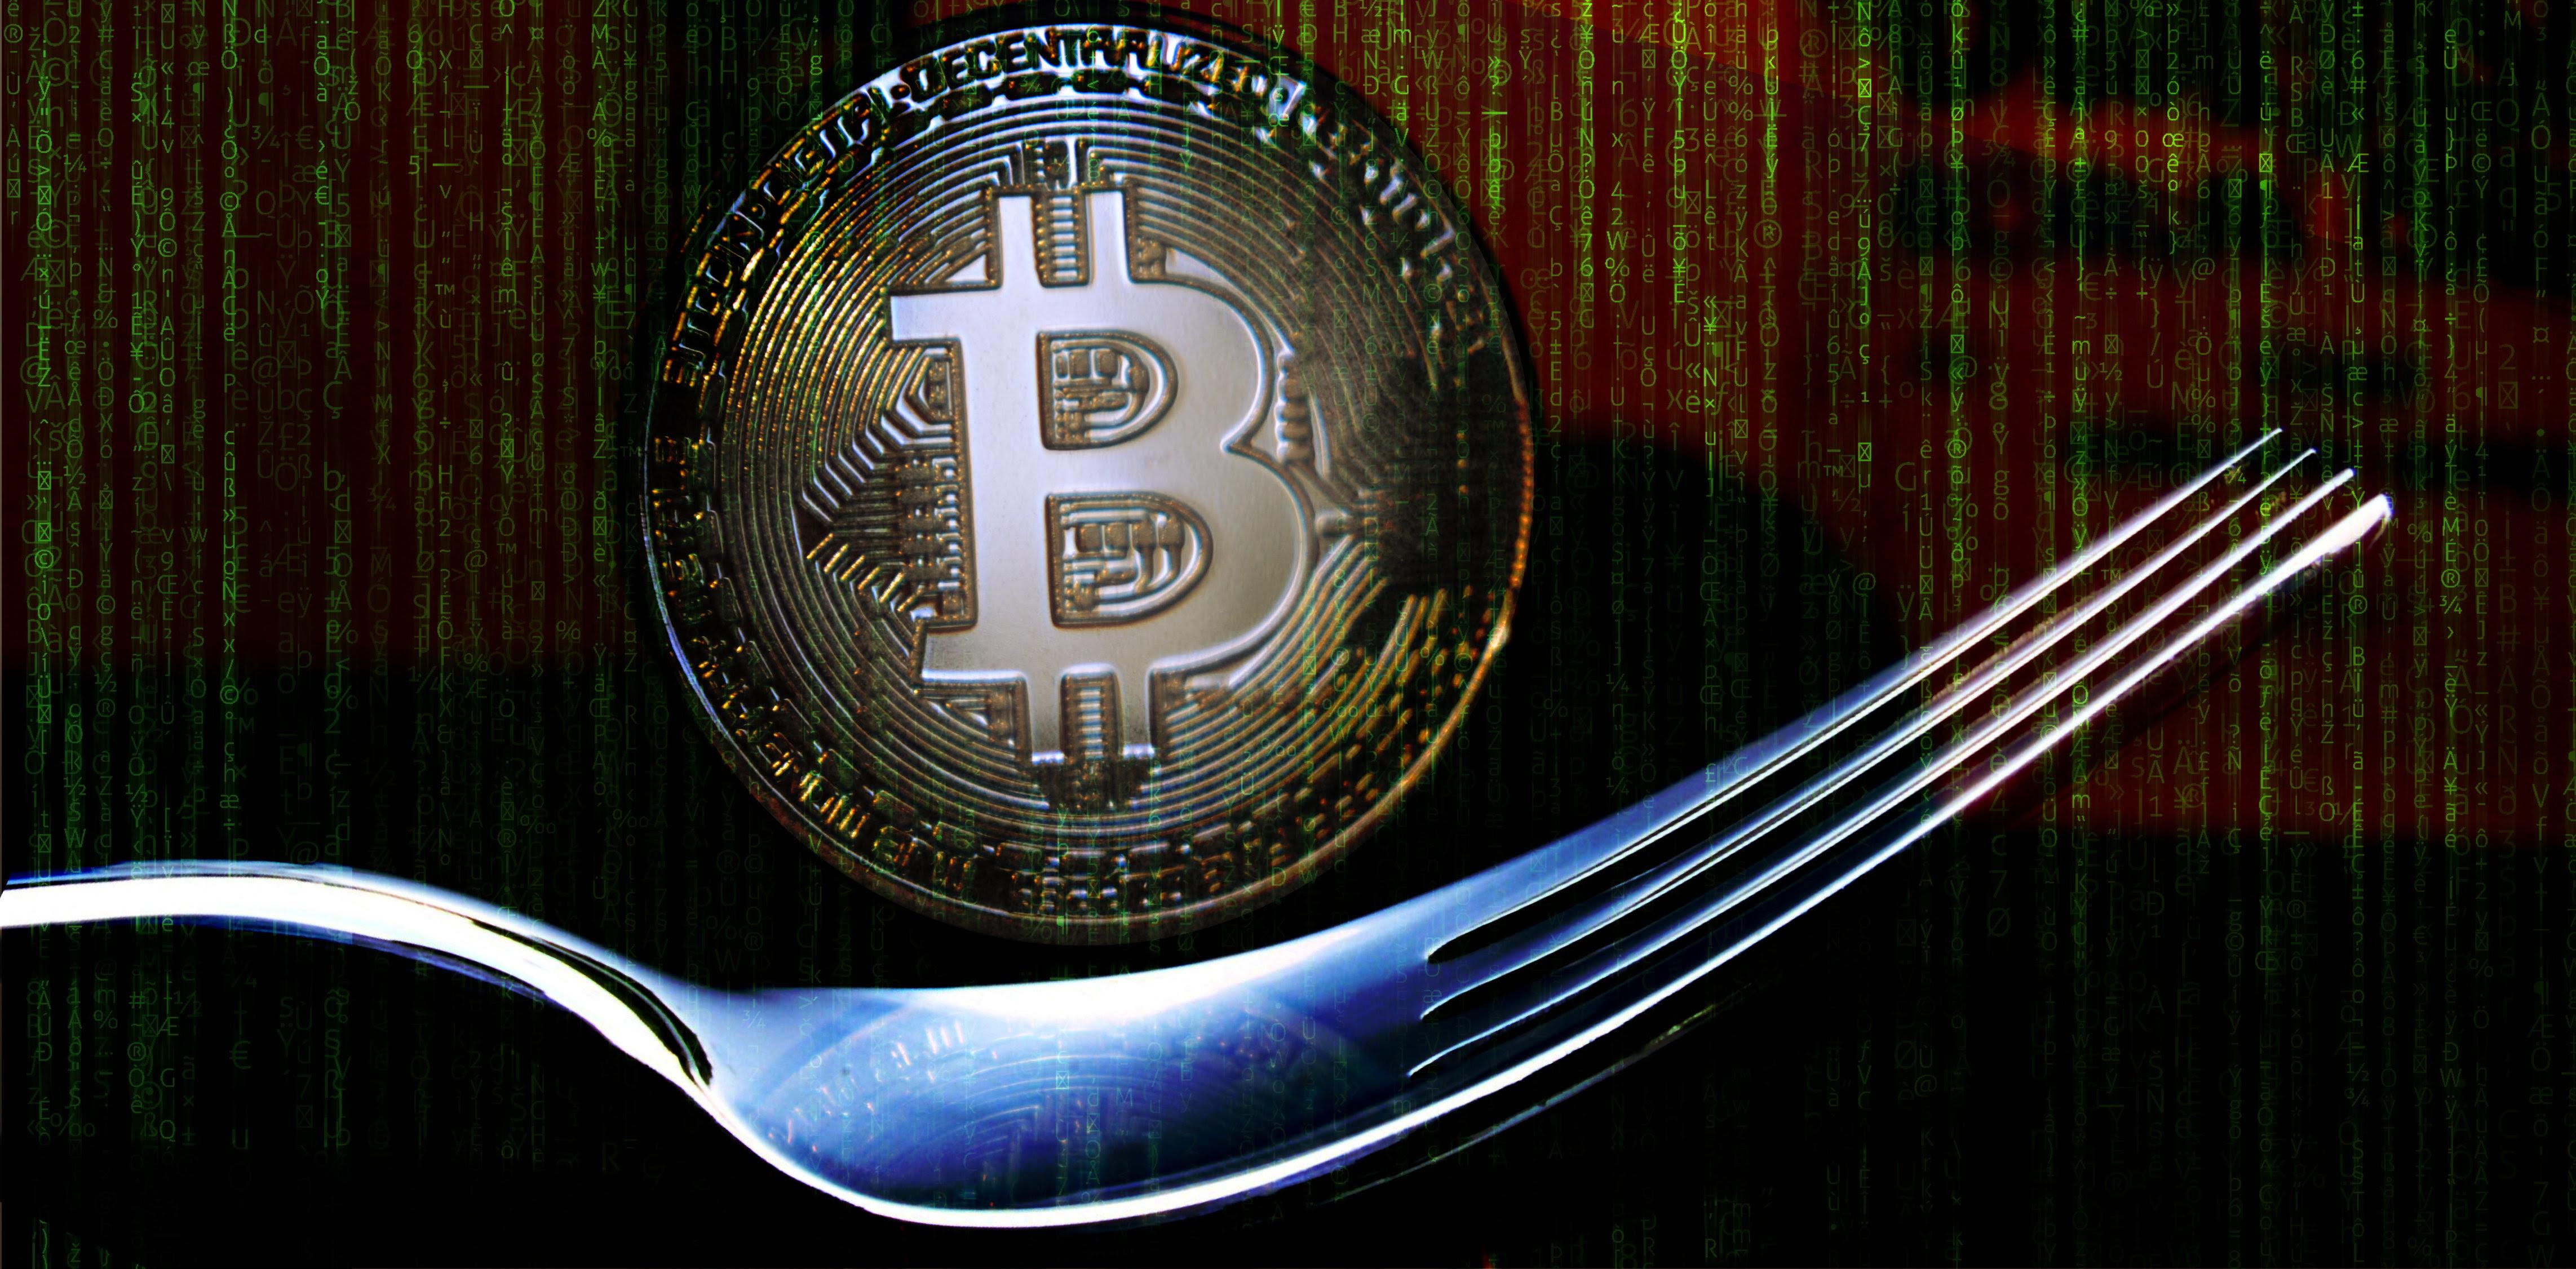 Bitcoin Segwit2x - An Opportunity - HowIGrowMyWealth.com